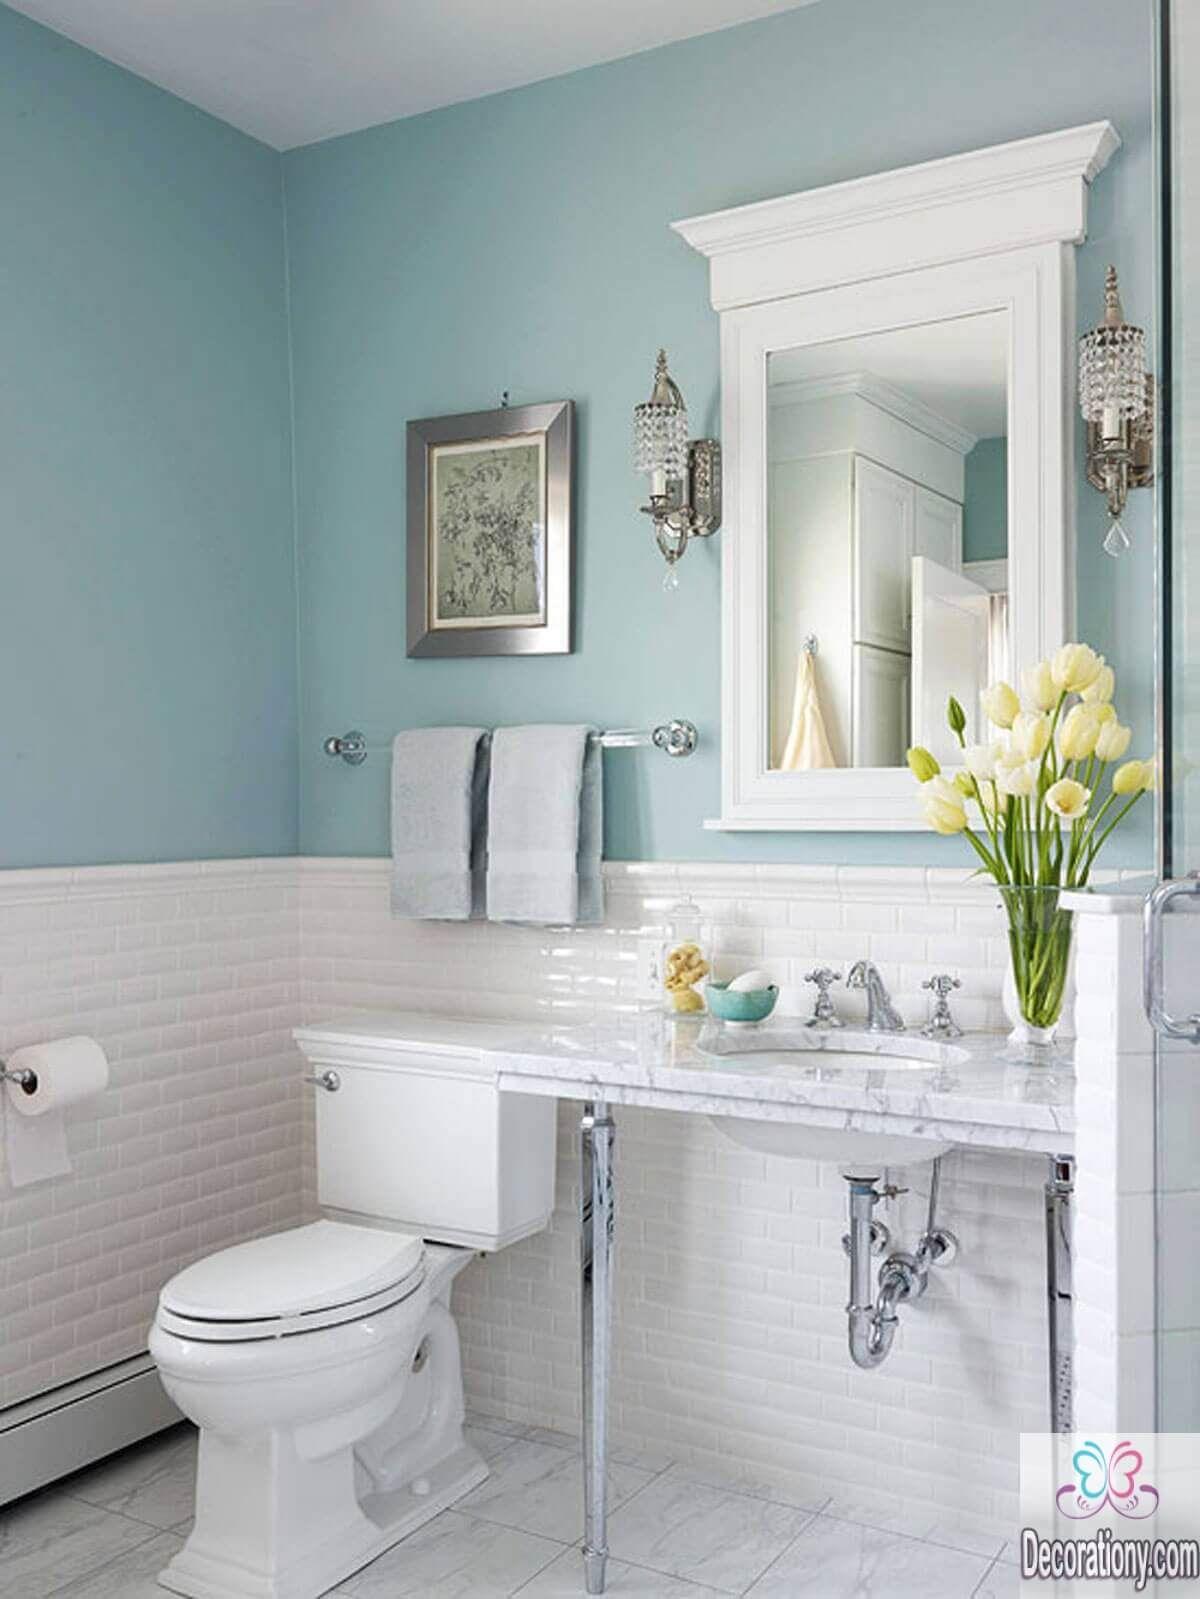 15+ Small White Beautiful Bathroom Remodel Ideas   Small bathroom ...